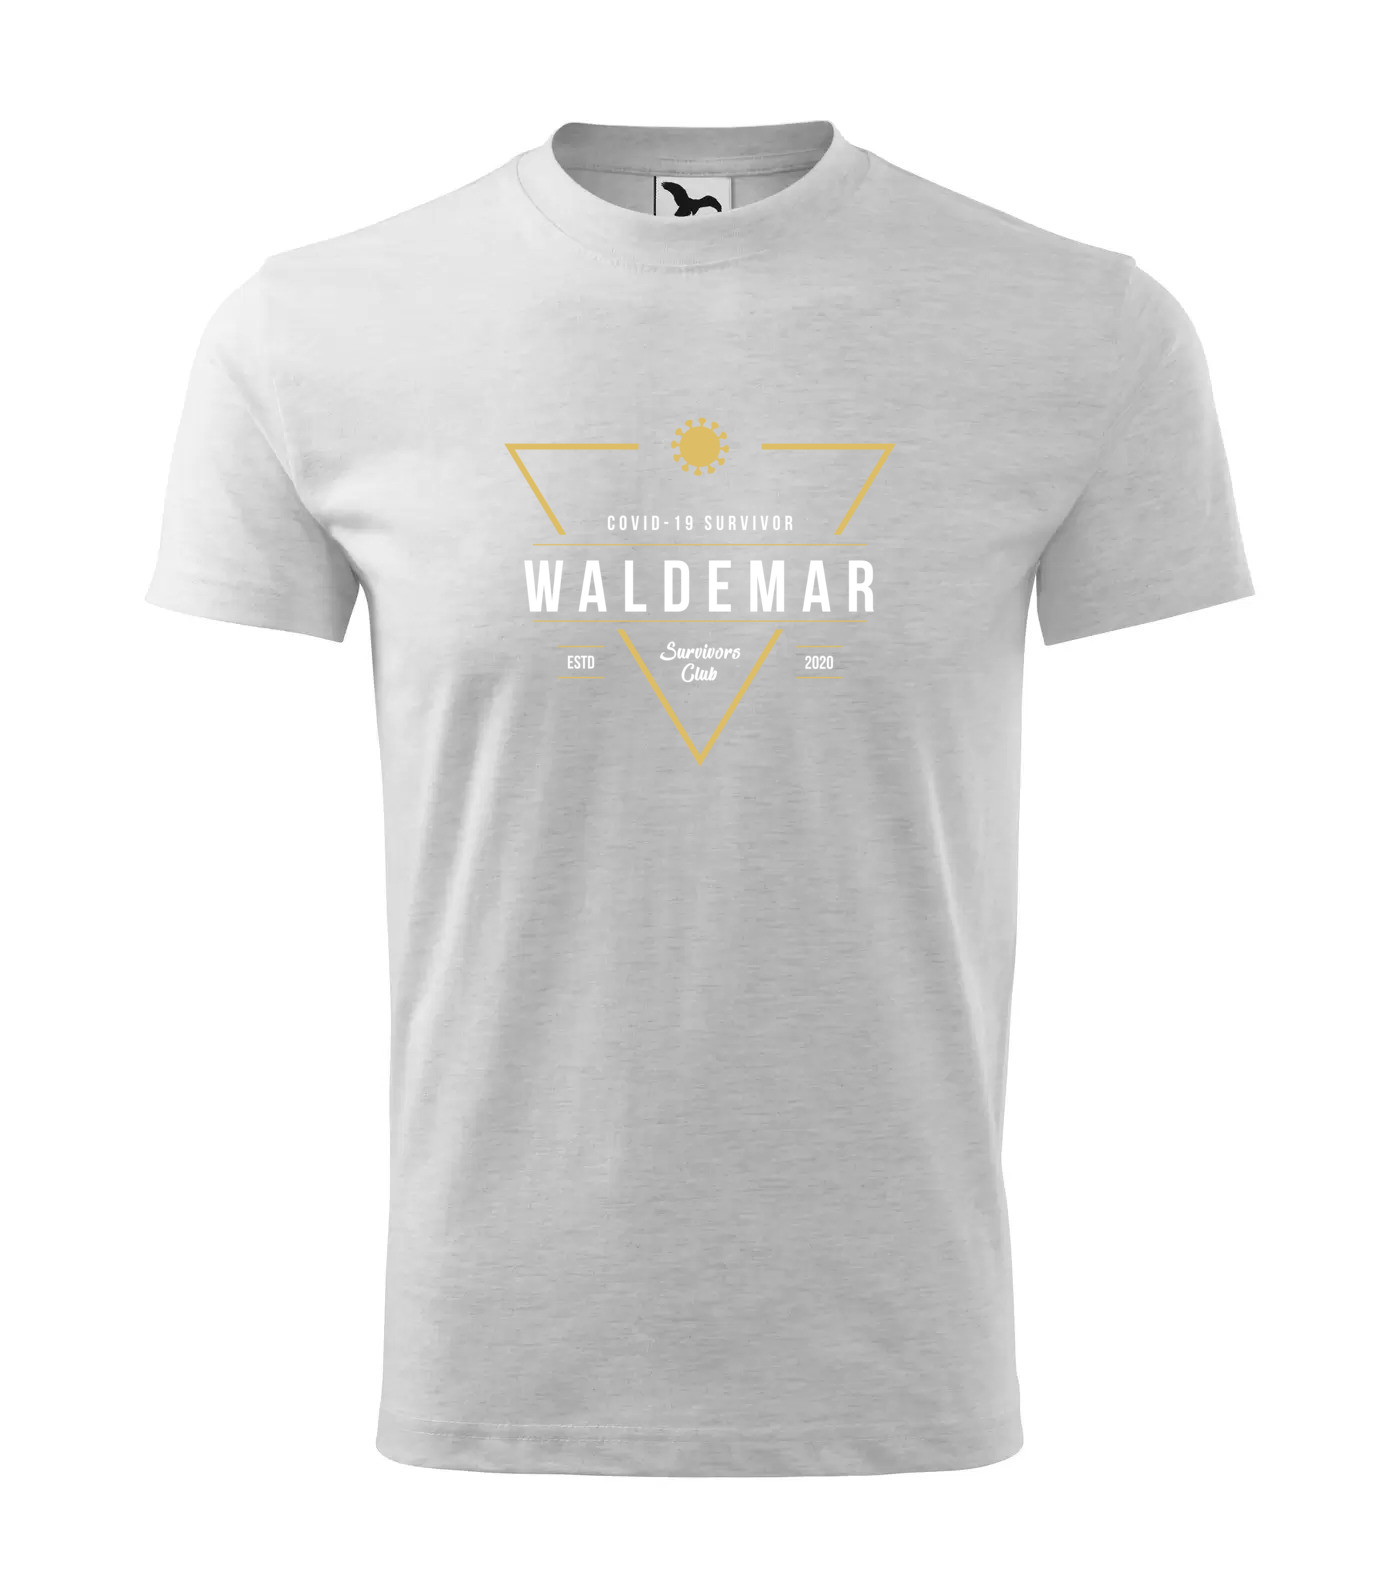 Tričko Survivor Club Waldemar